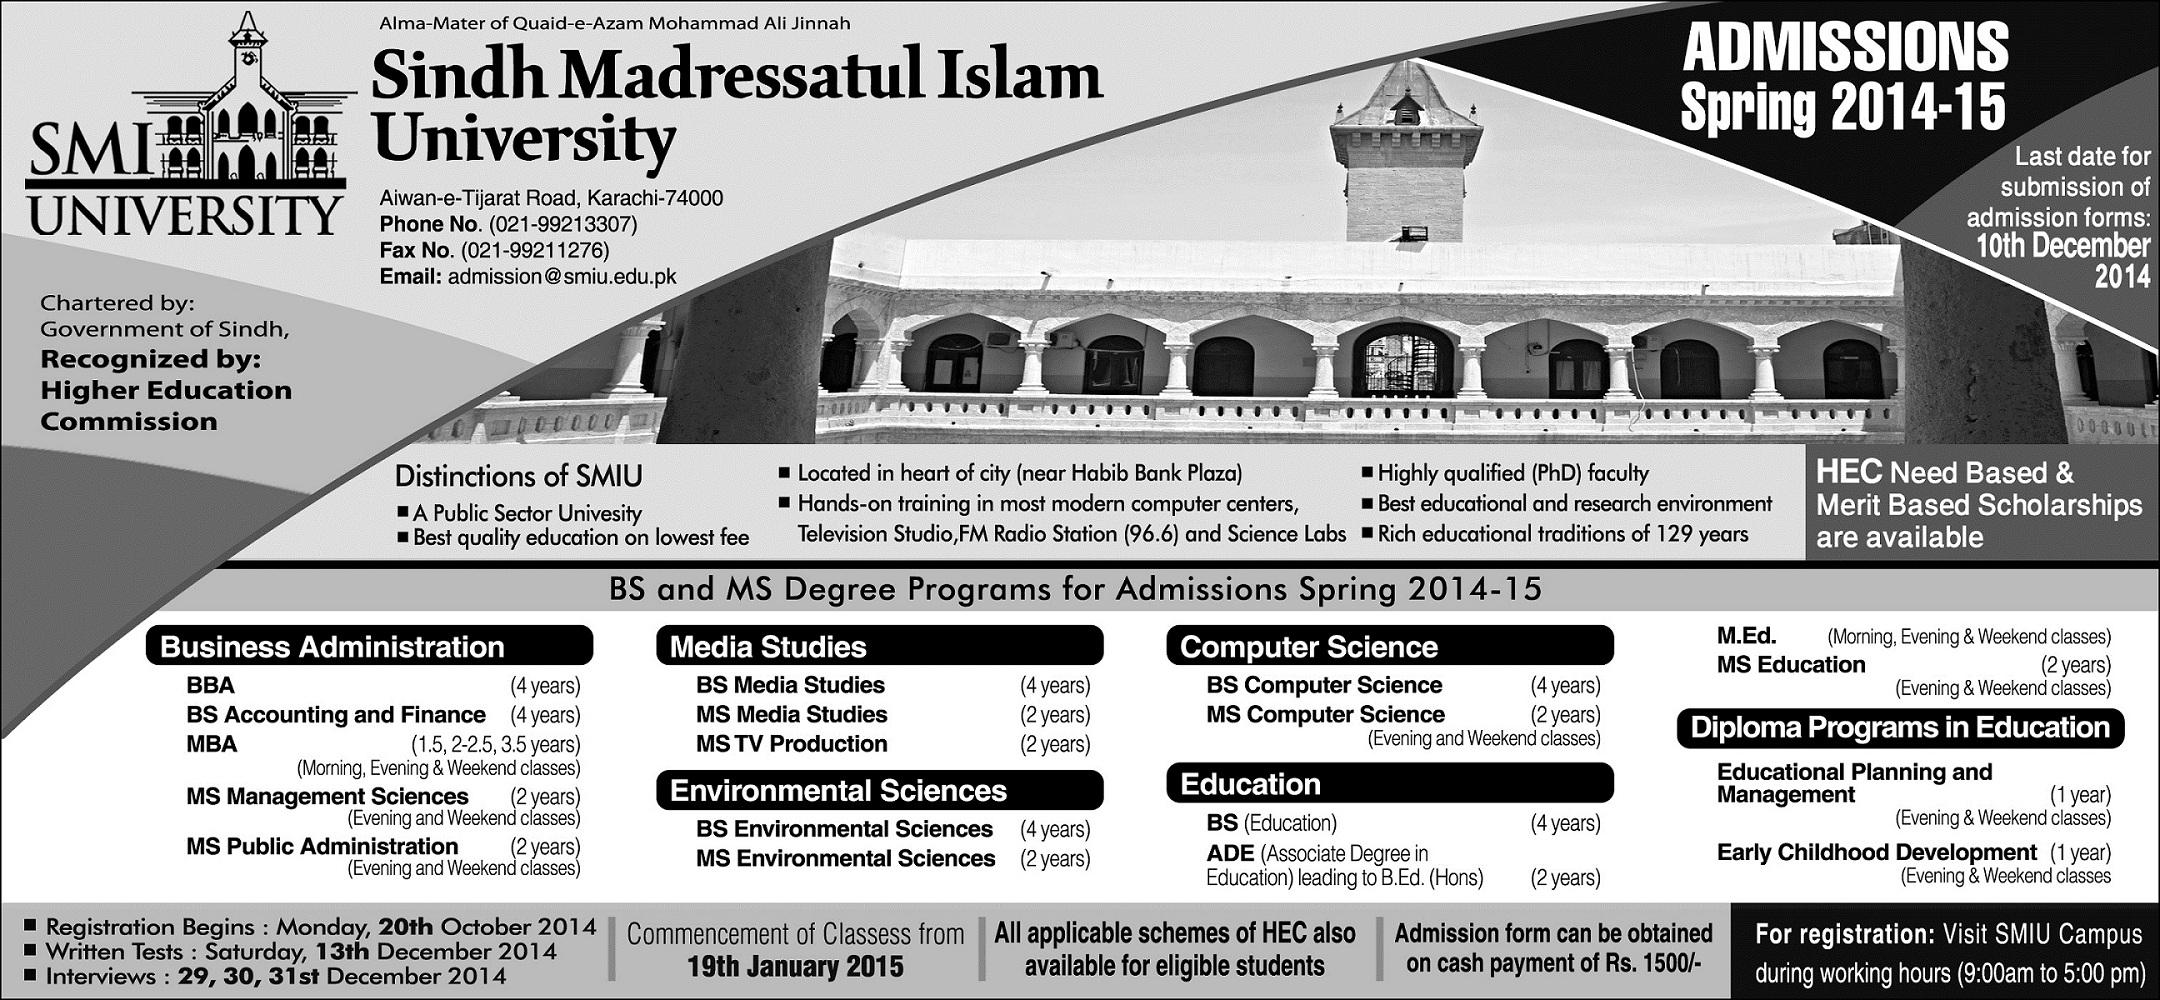 SMI Sindh Madressatul Islam University Spring Admission 2015-2016 Form